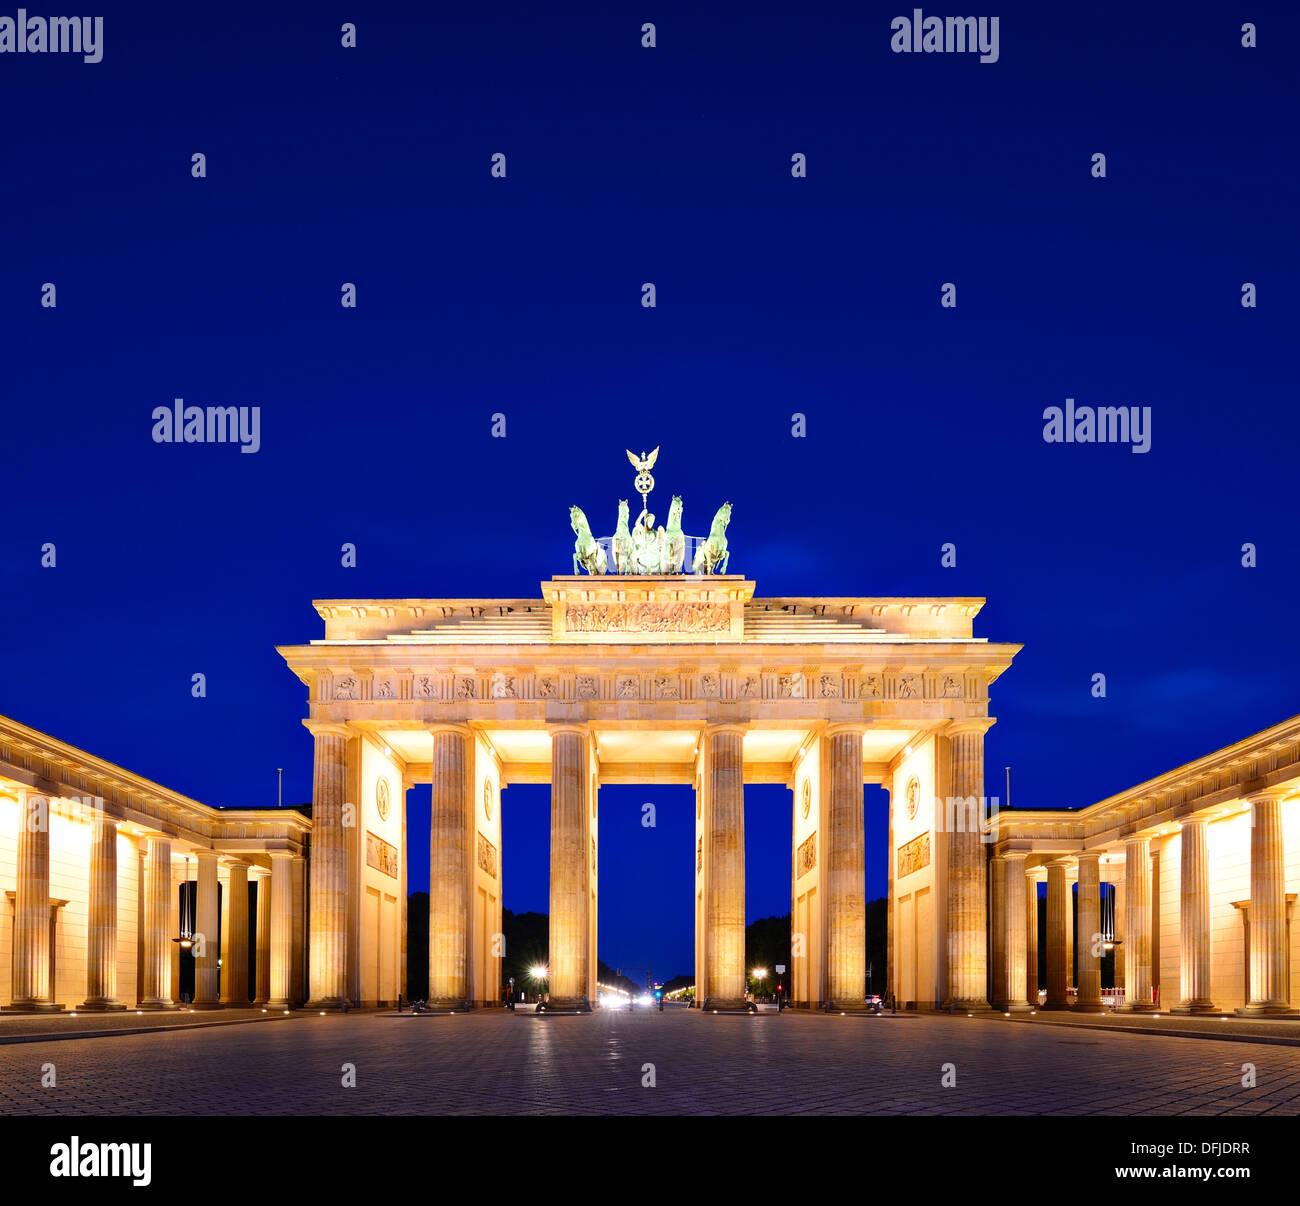 La porte de Brandebourg à Berlin, Allemagne. Photo Stock